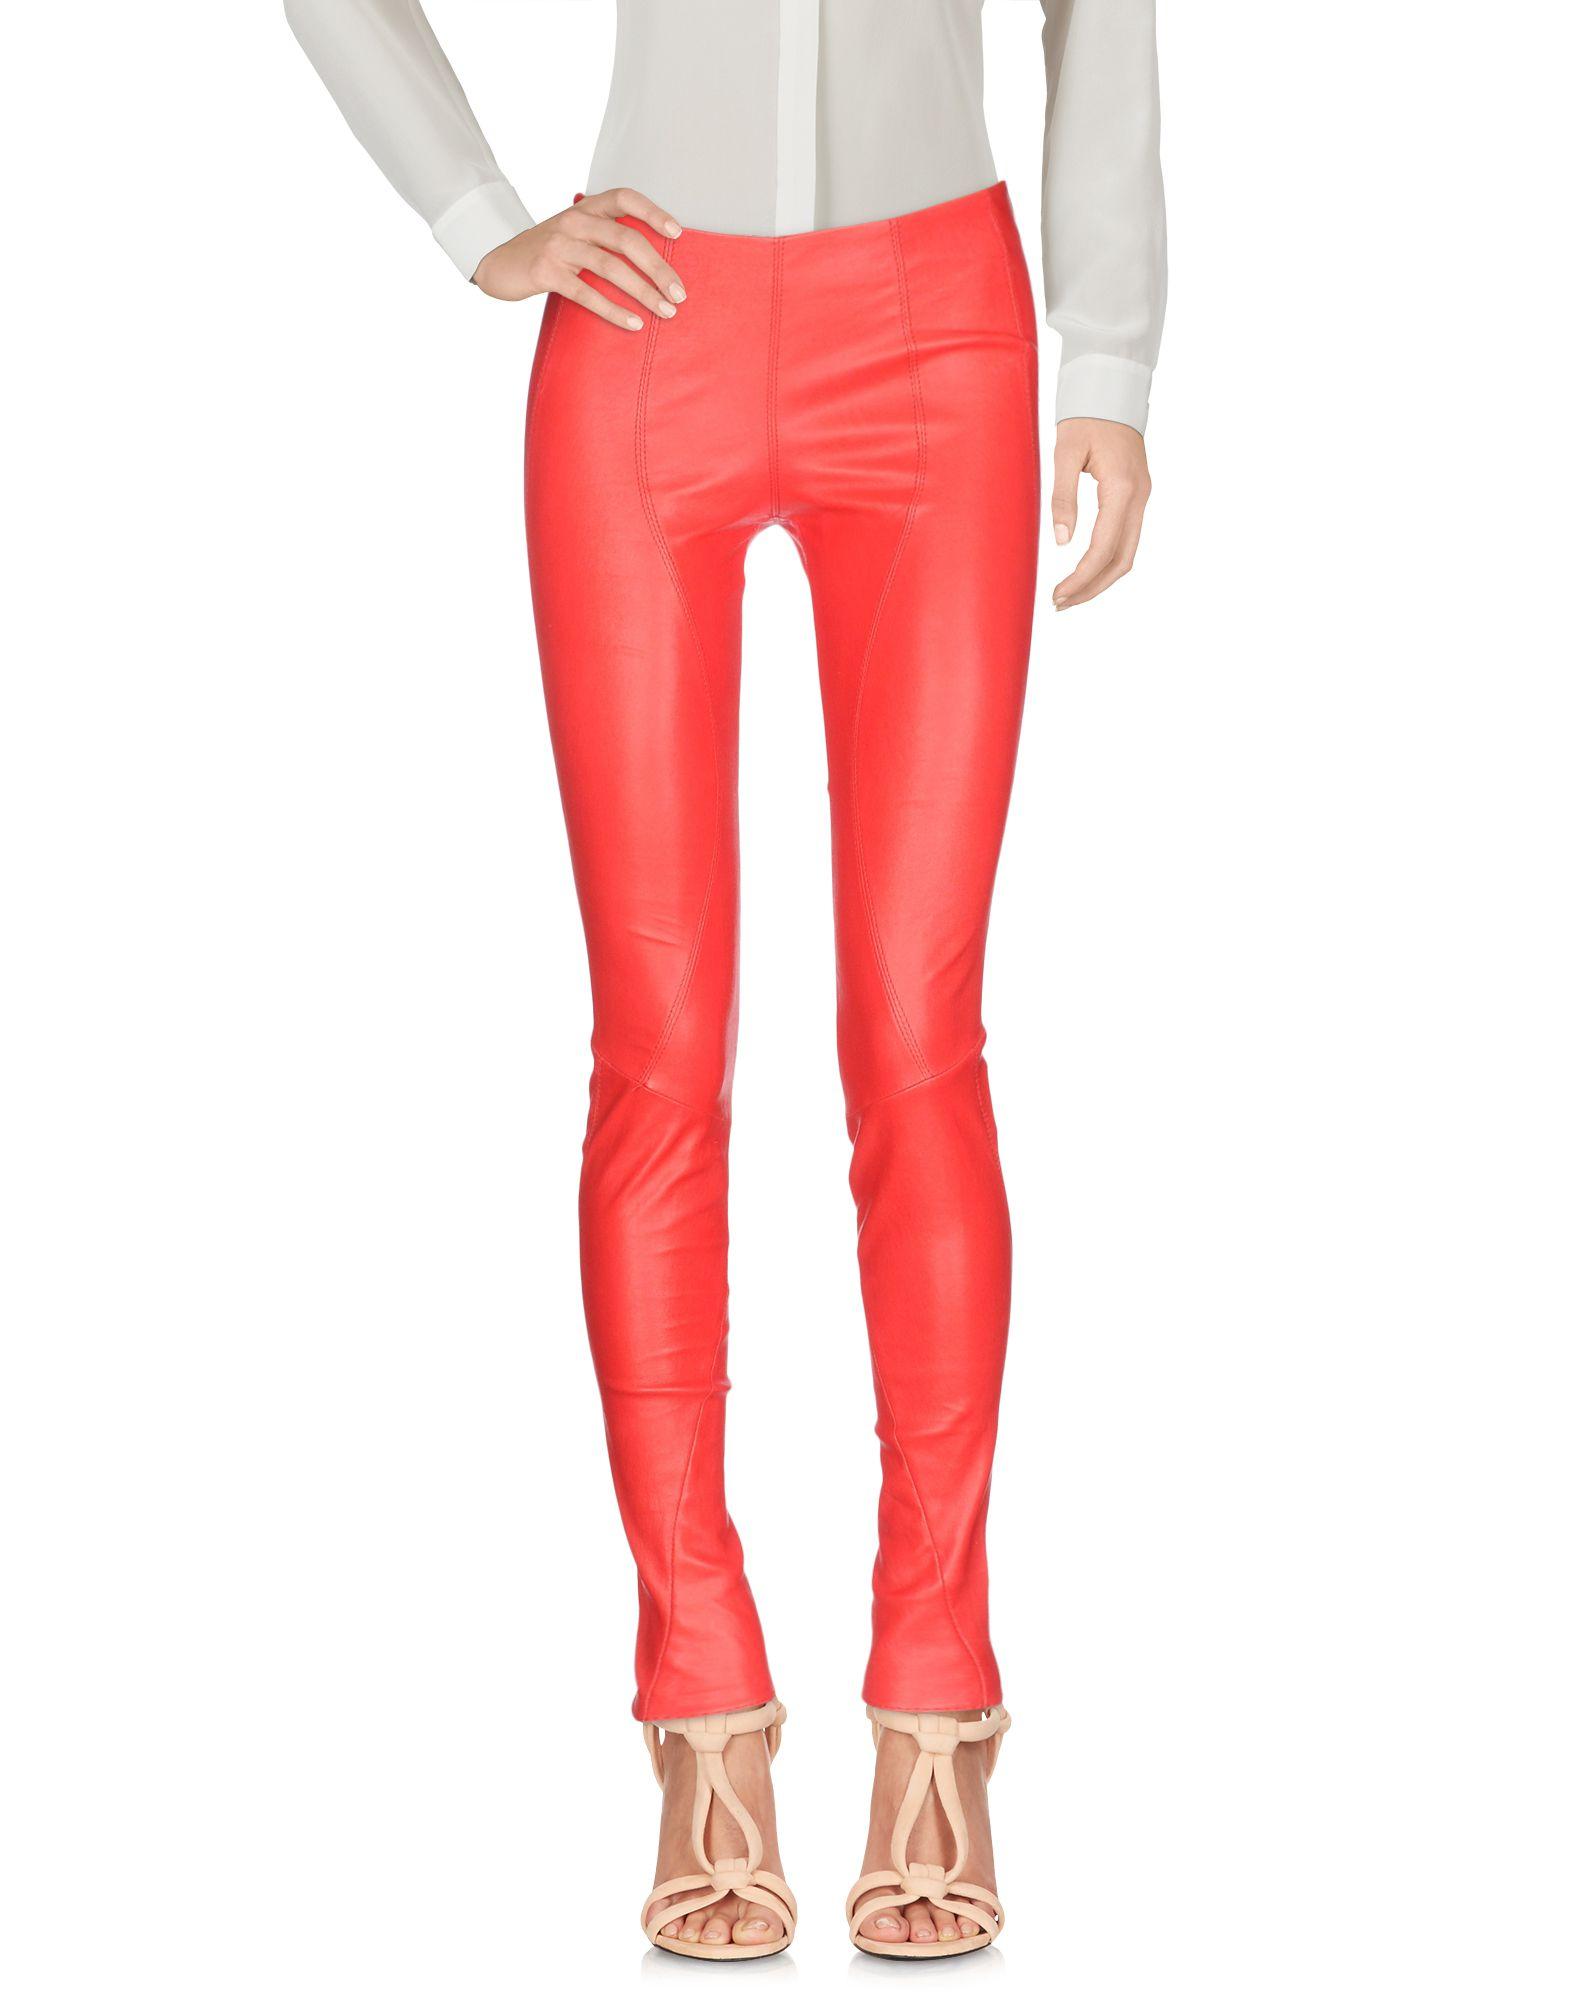 APHERO Casual Pants in Red